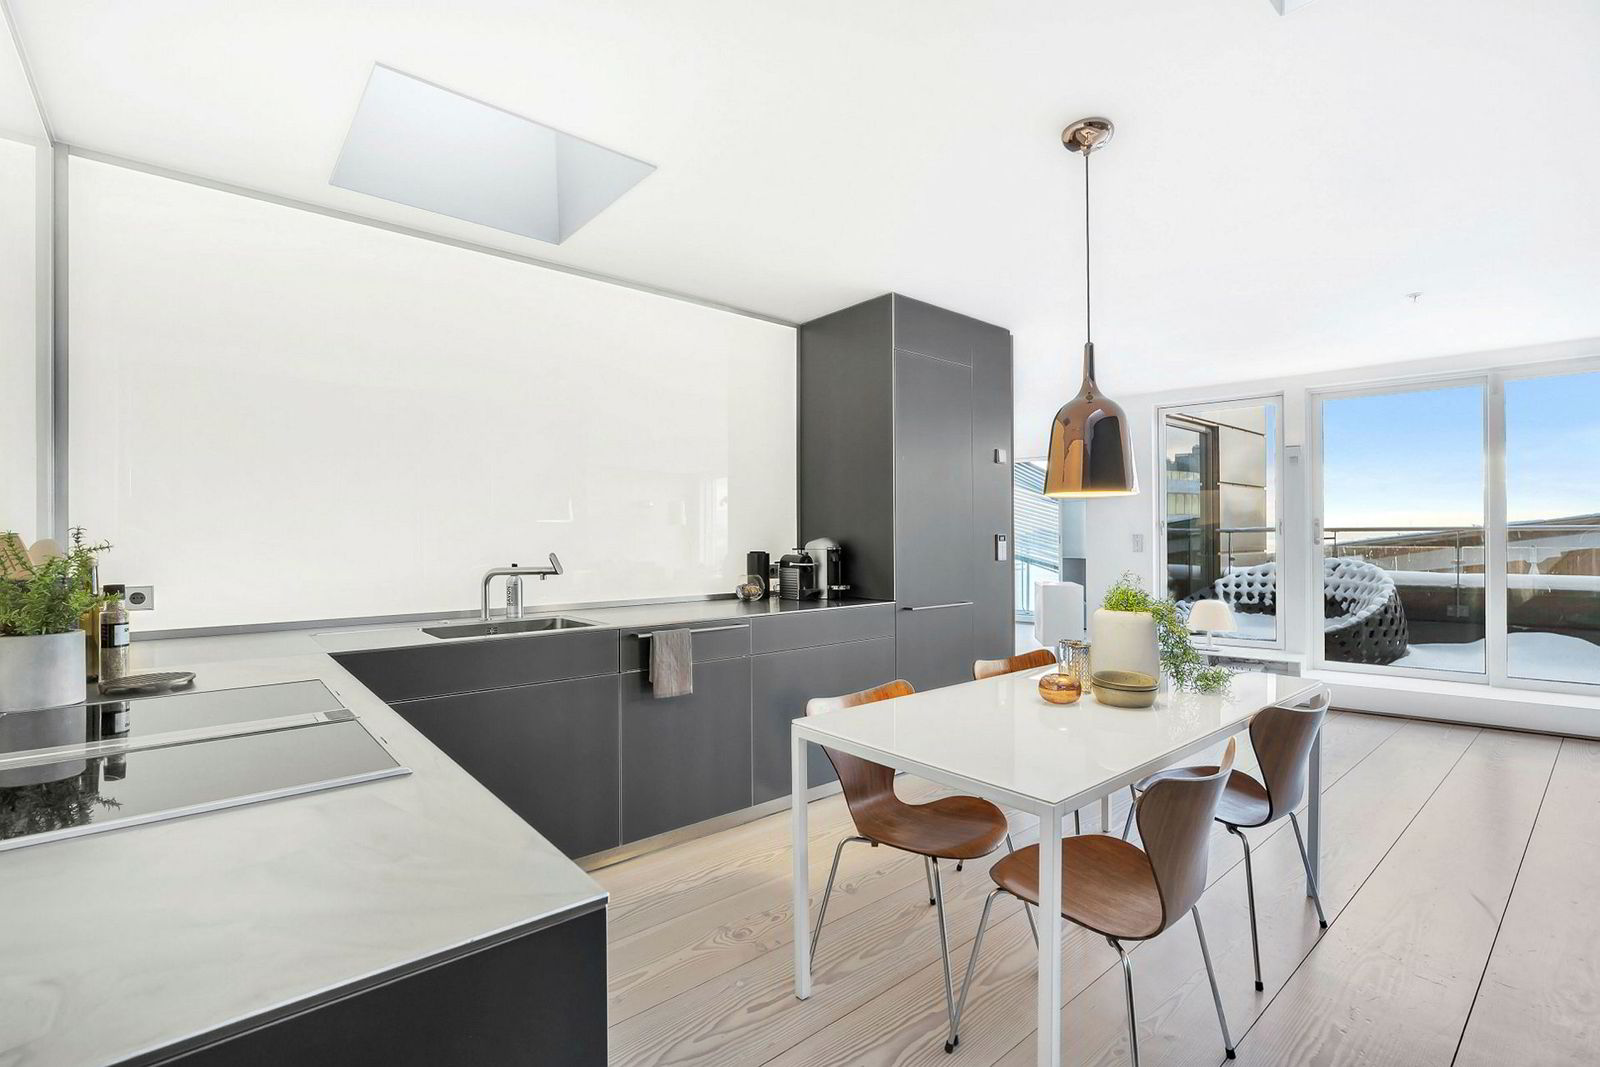 Krafttrader Einar Aas selger nå leiligheten på Strandpromenaden 5 på Tjuvholmen for 70 millioner kroner.